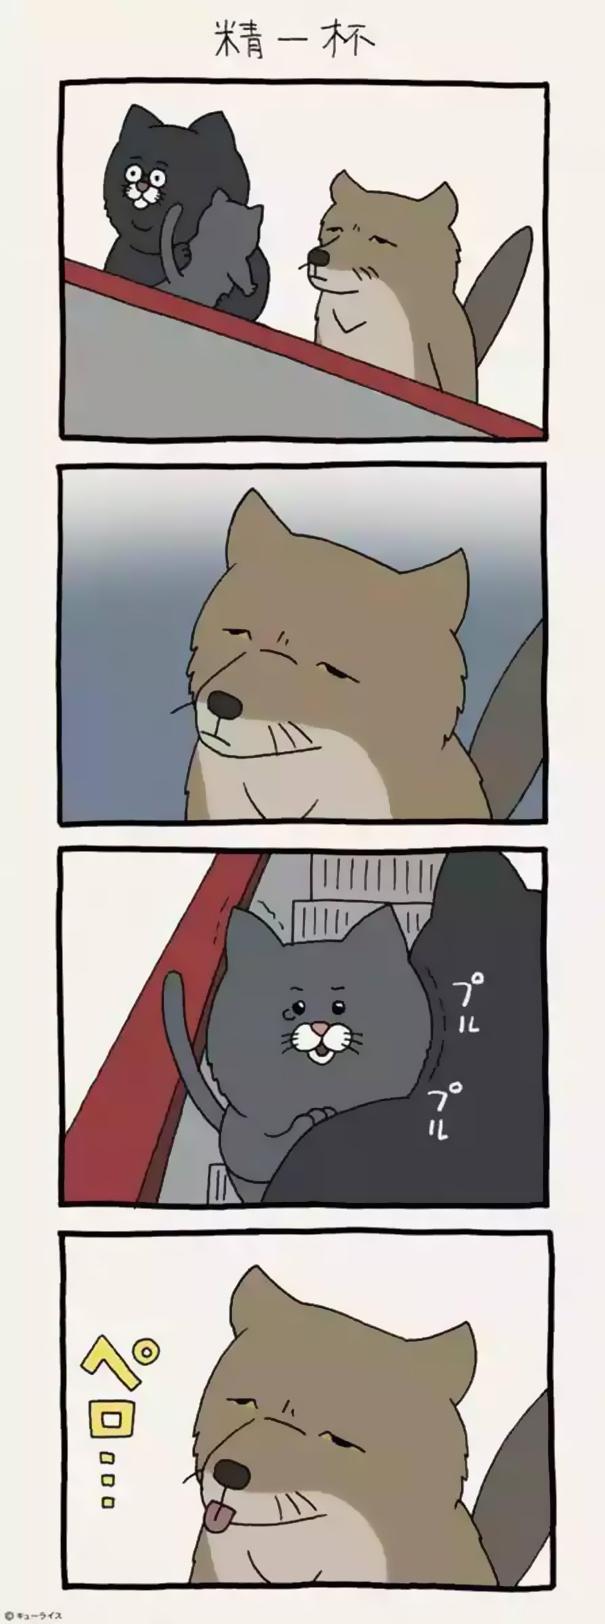 dog cartoon comics qrais japan 12 59895b4608e7f  605 - 우울한 당신을 웃게 해줄 '착한 티벳 여우' 4컷 만화